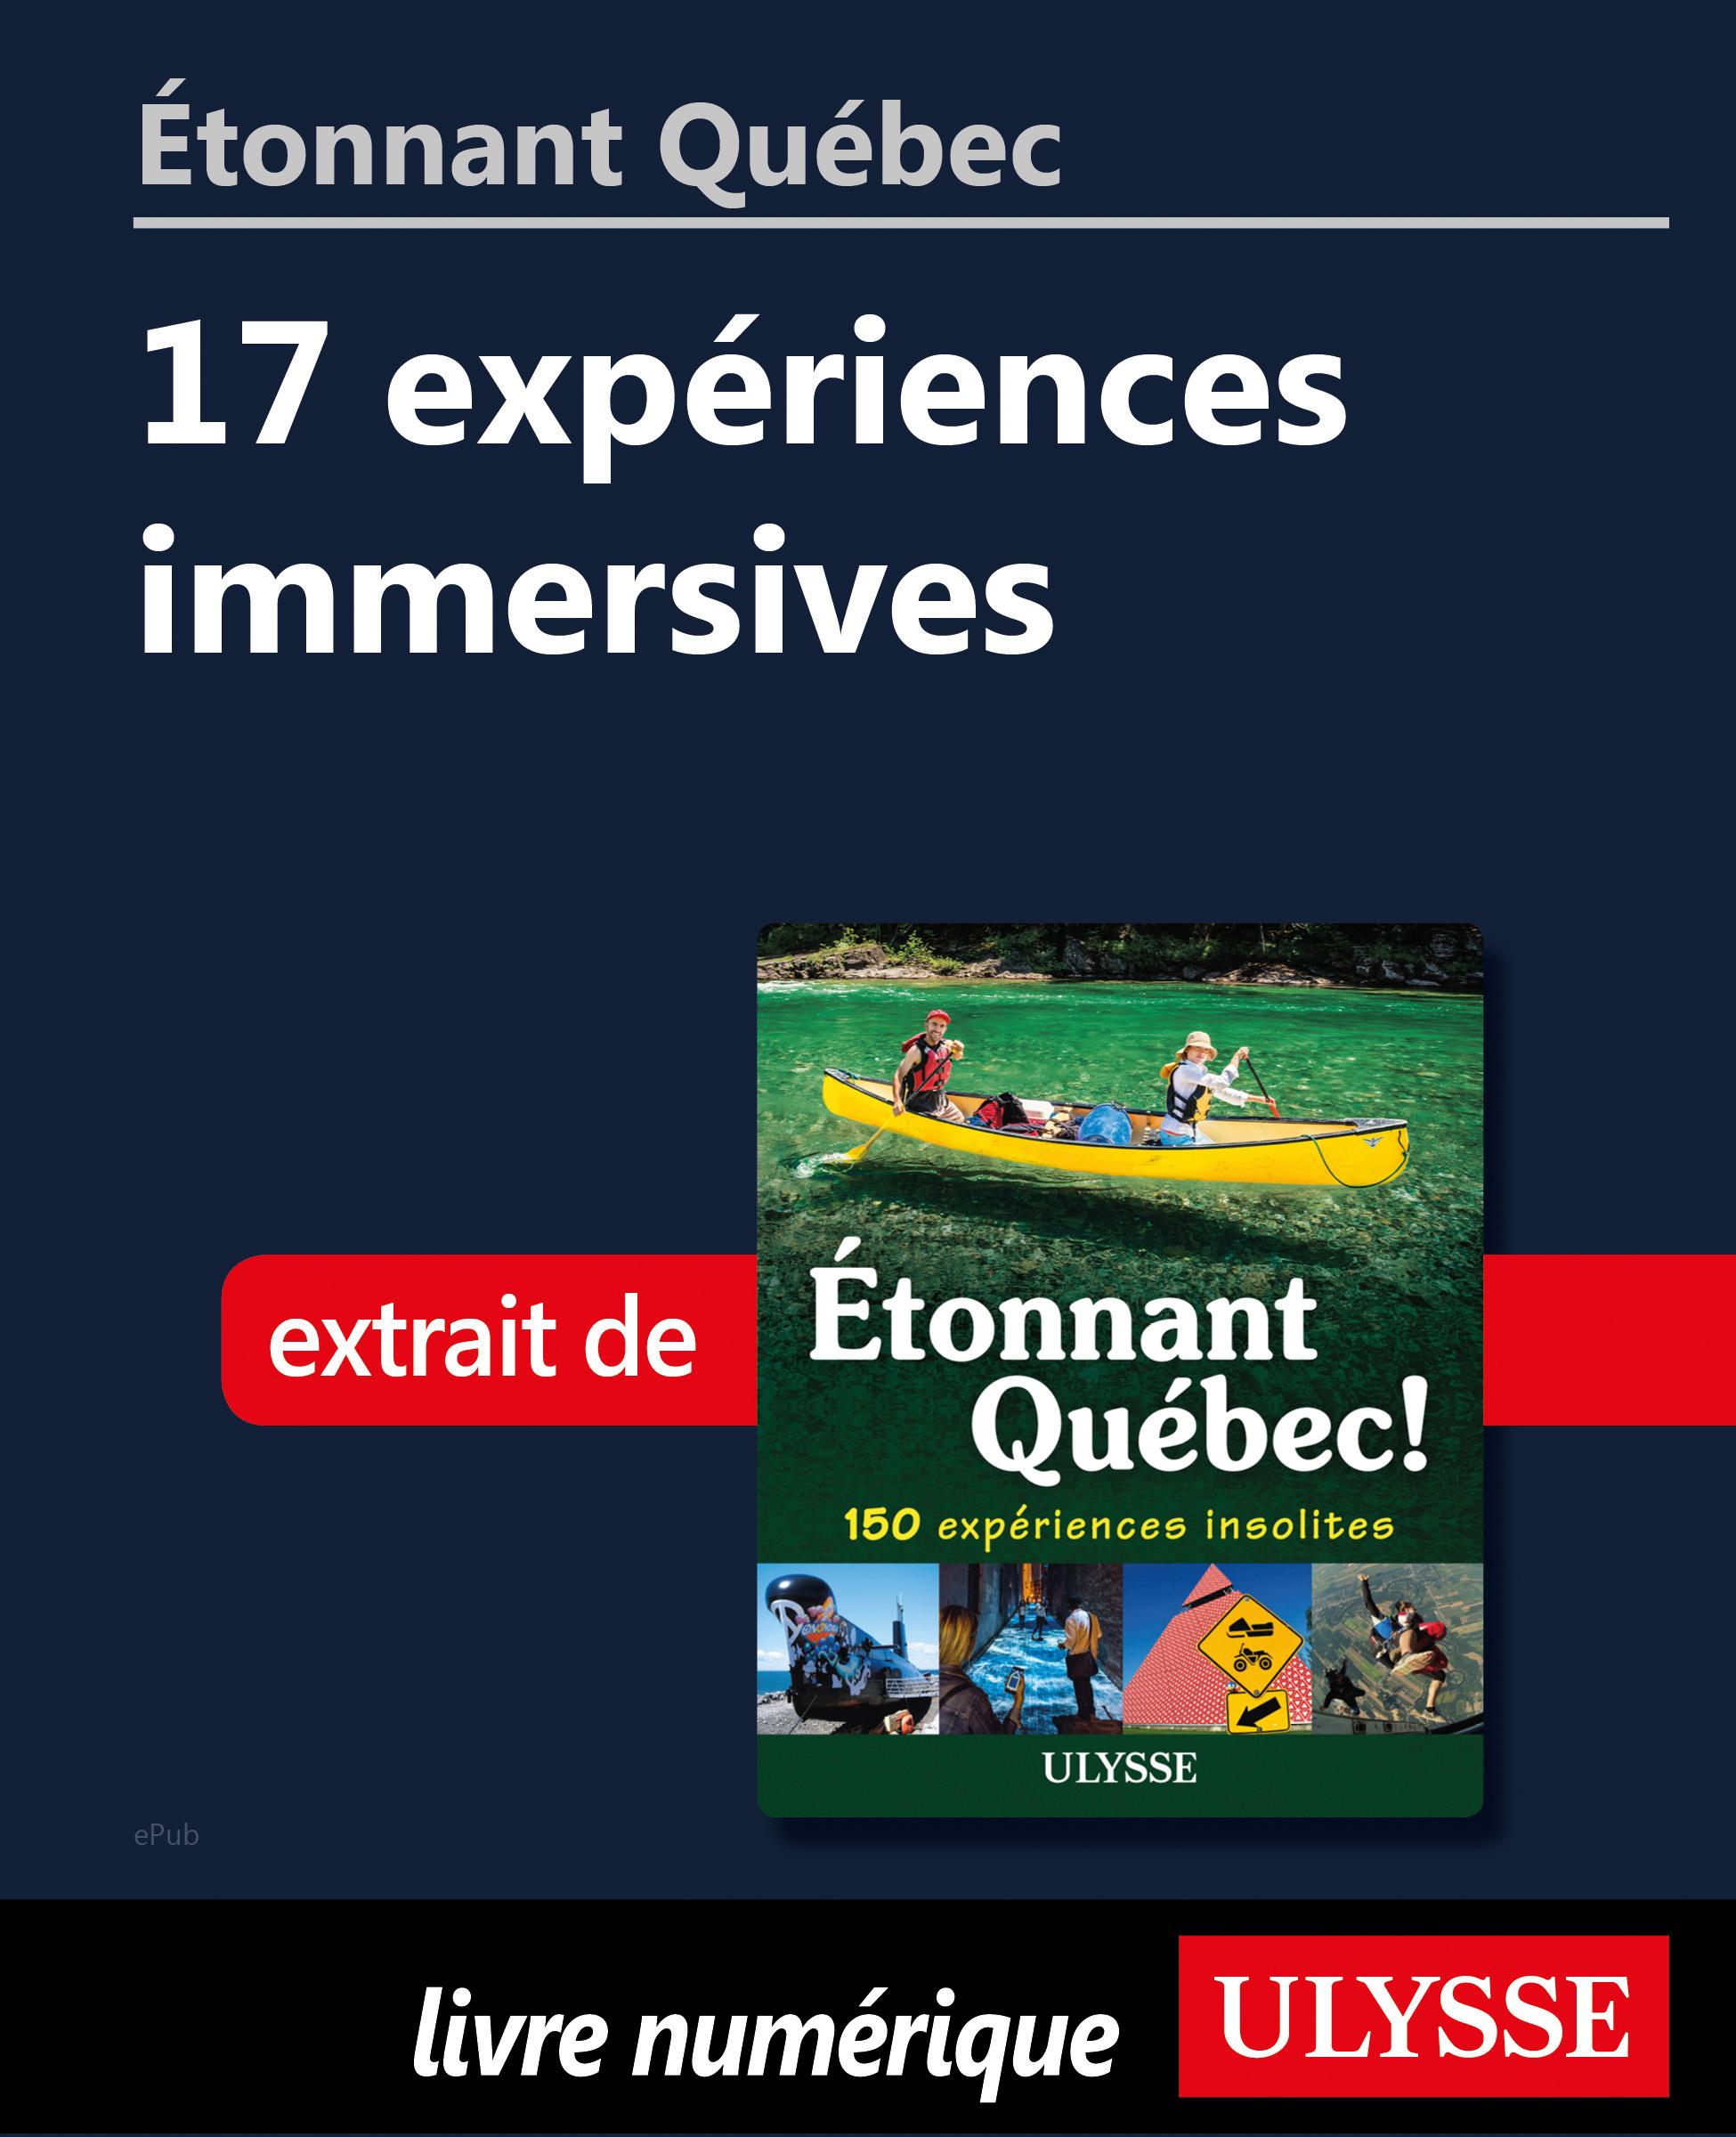 Étonnant Québec: 17 expérie...